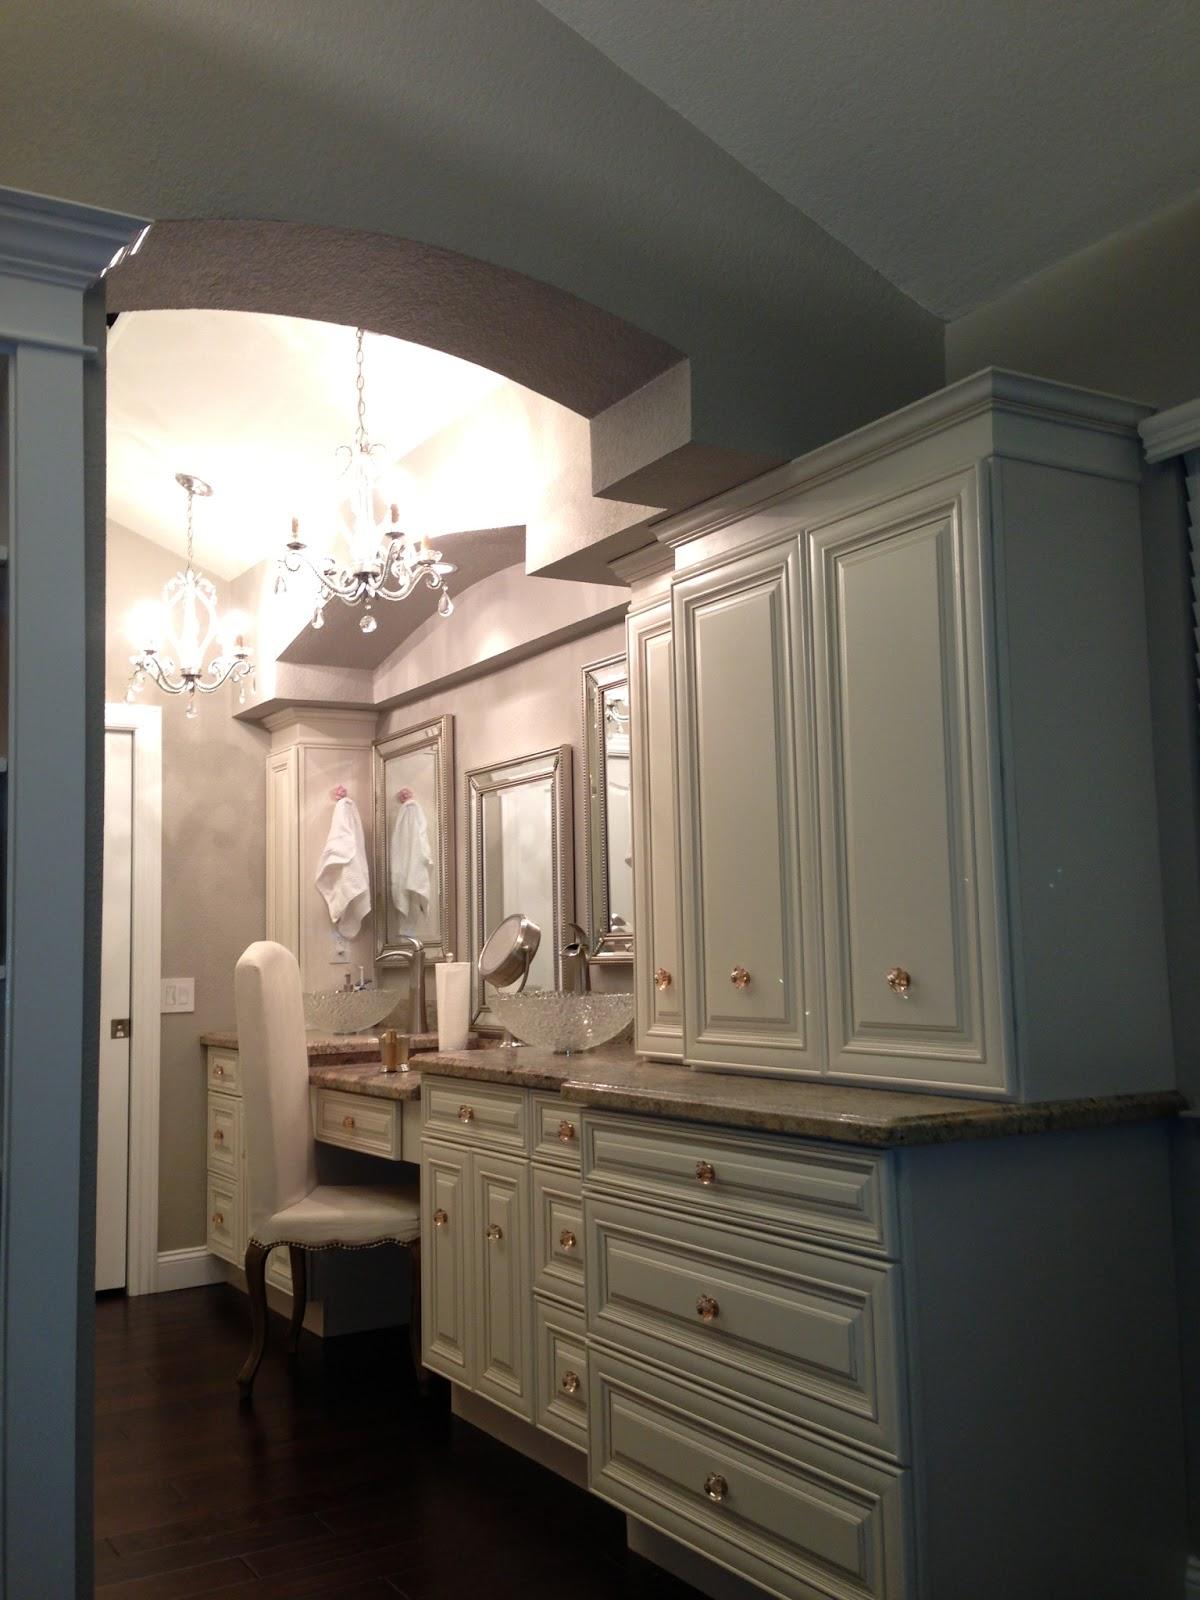 Kitchen and bath cabinets vanities home decor design ideas photos pierce kitchen and bath for Kitchen and bathroom cabinets